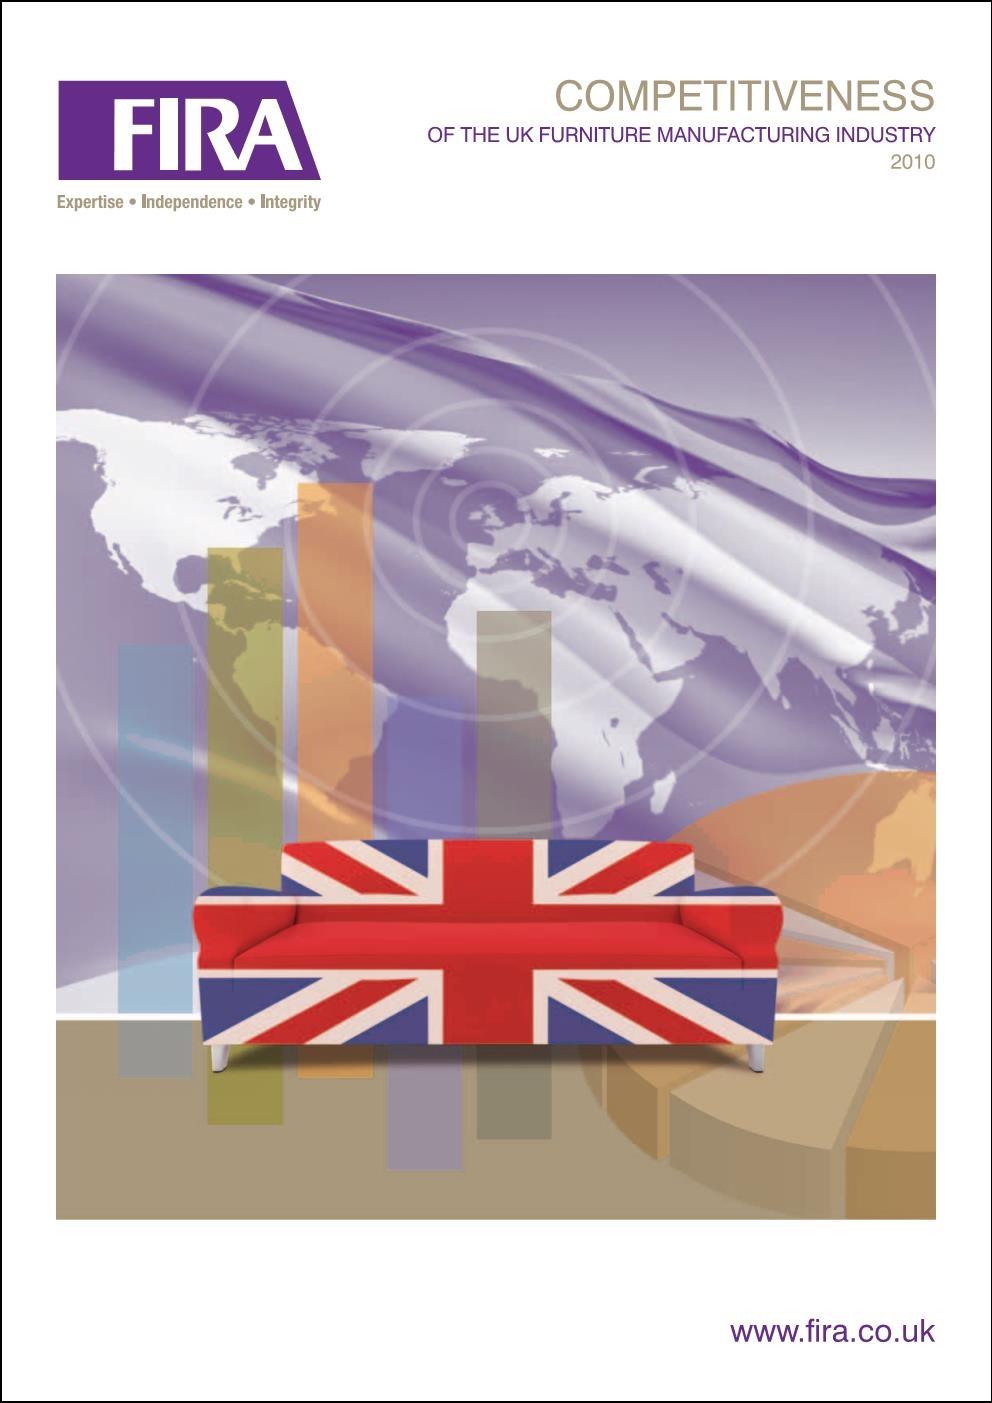 Cover-Competitiveness-Study-2010.jpg#asset:1193:url